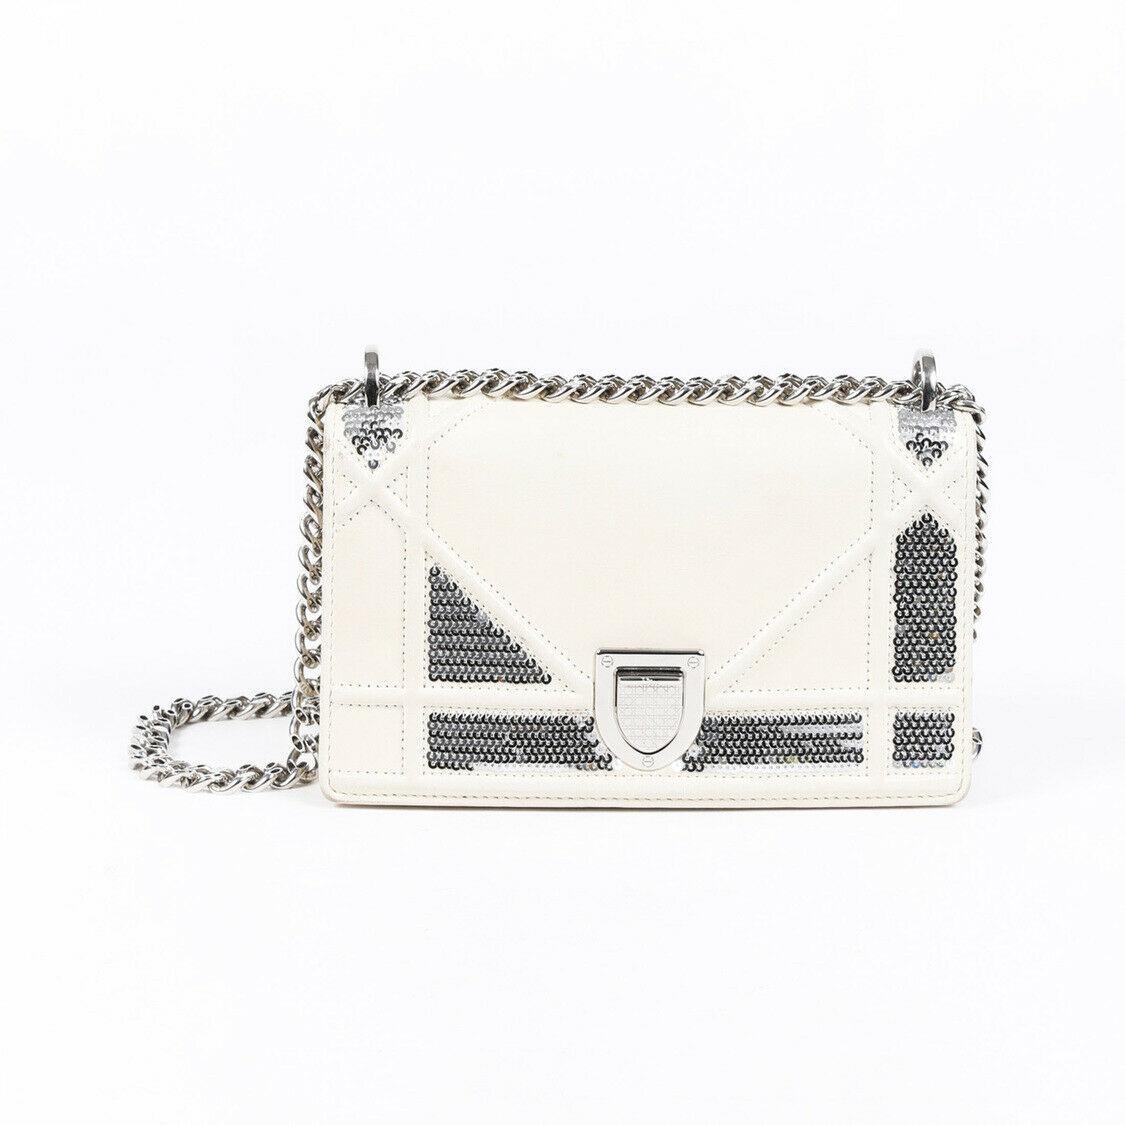 Christian Dior Mini Diorama Sequin Shoulder Bag - $735.00